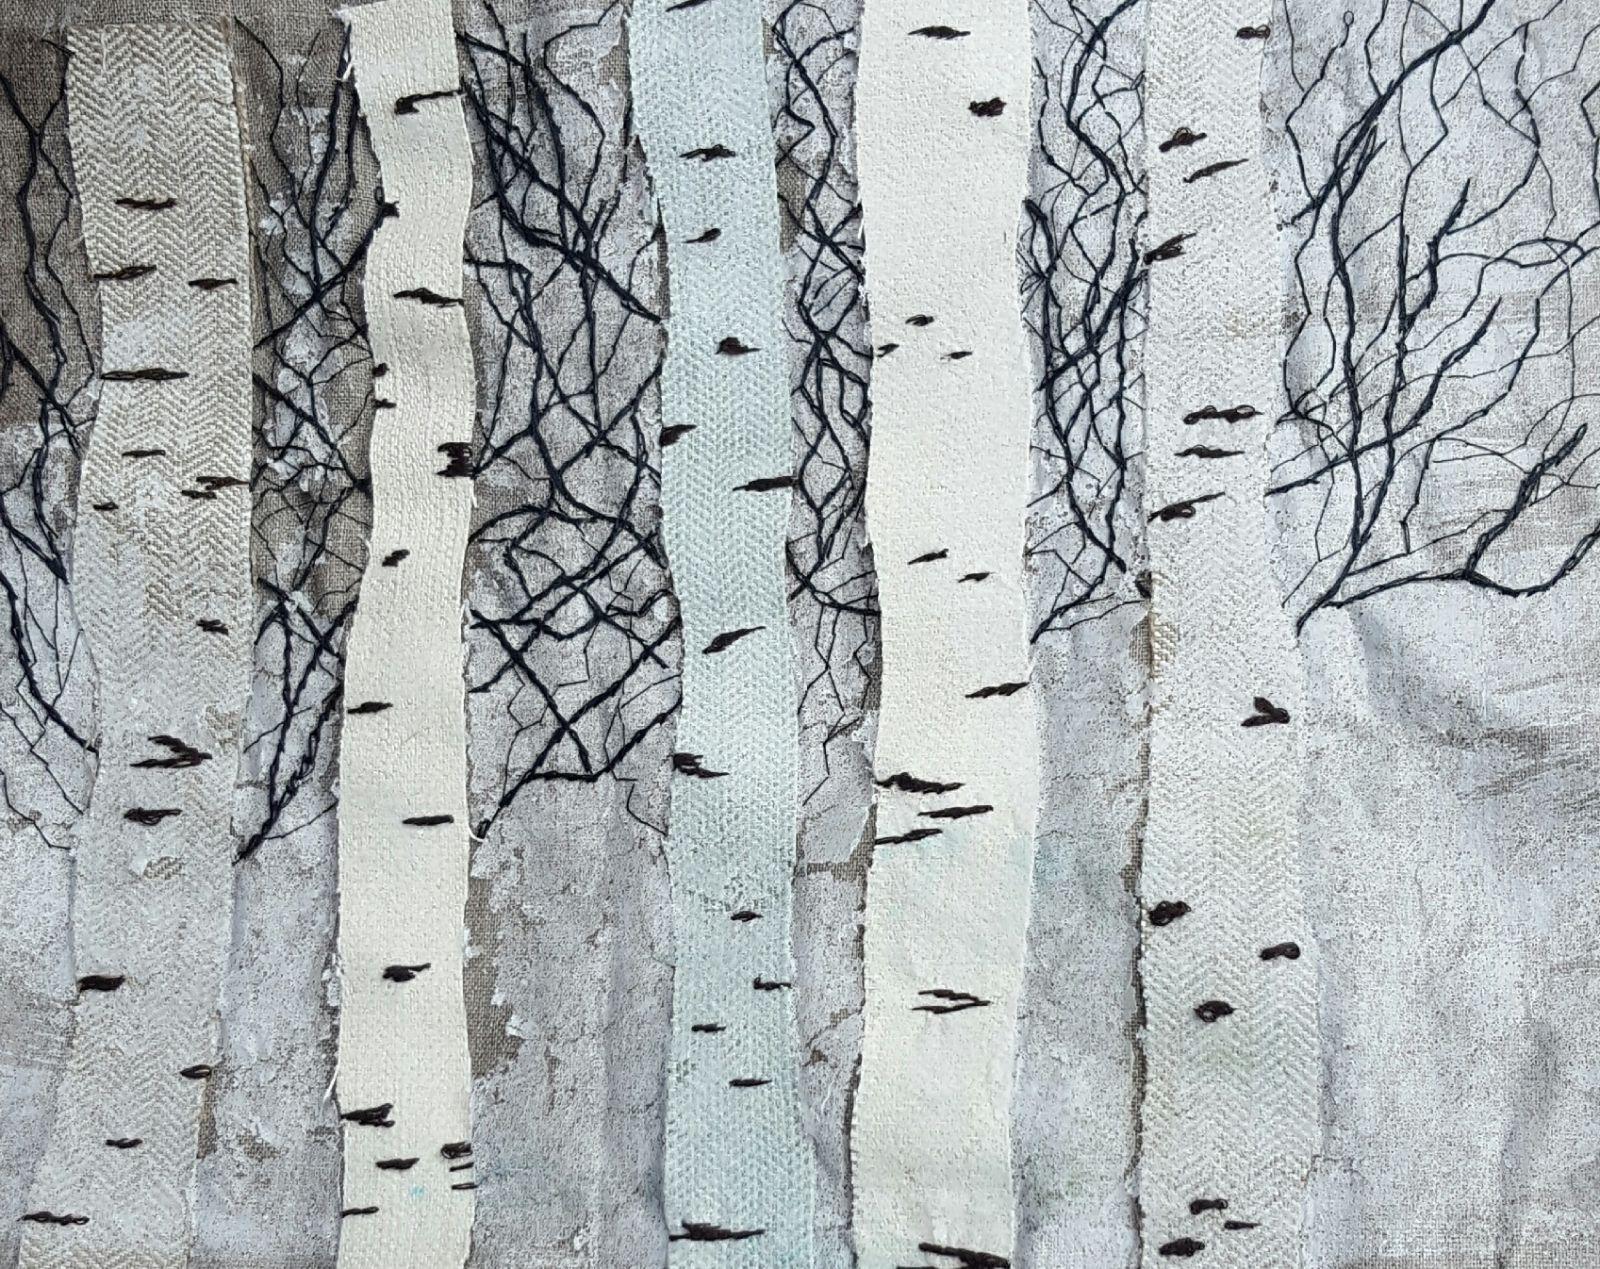 Birches I Winter Lines, Hannaleena Ahonen, element15